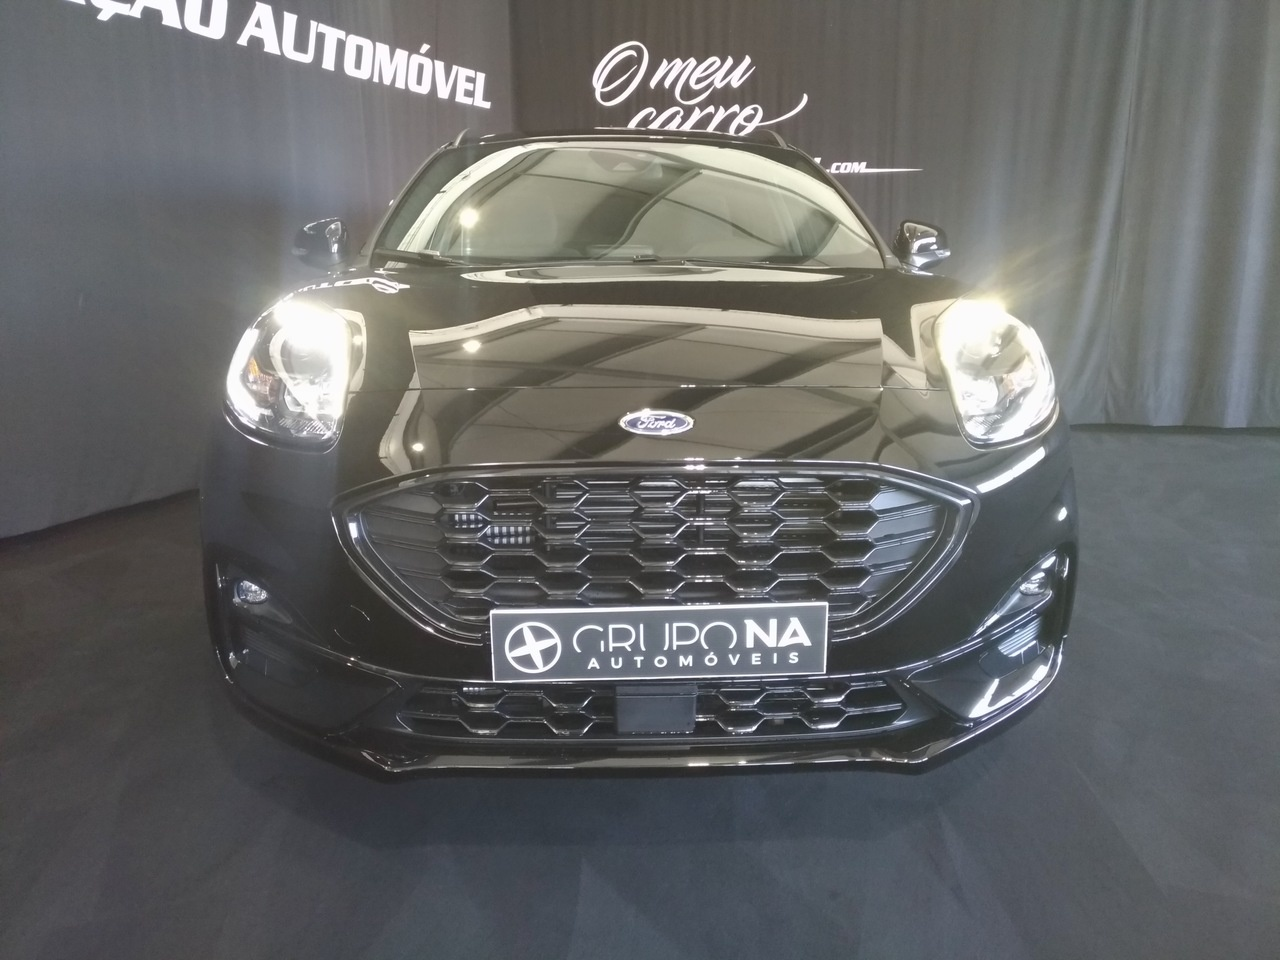 Ford Puma 1.0 EcoBoost MHEV 125cv 6 velocidades ST Line Plus 5 lugares 5 portas